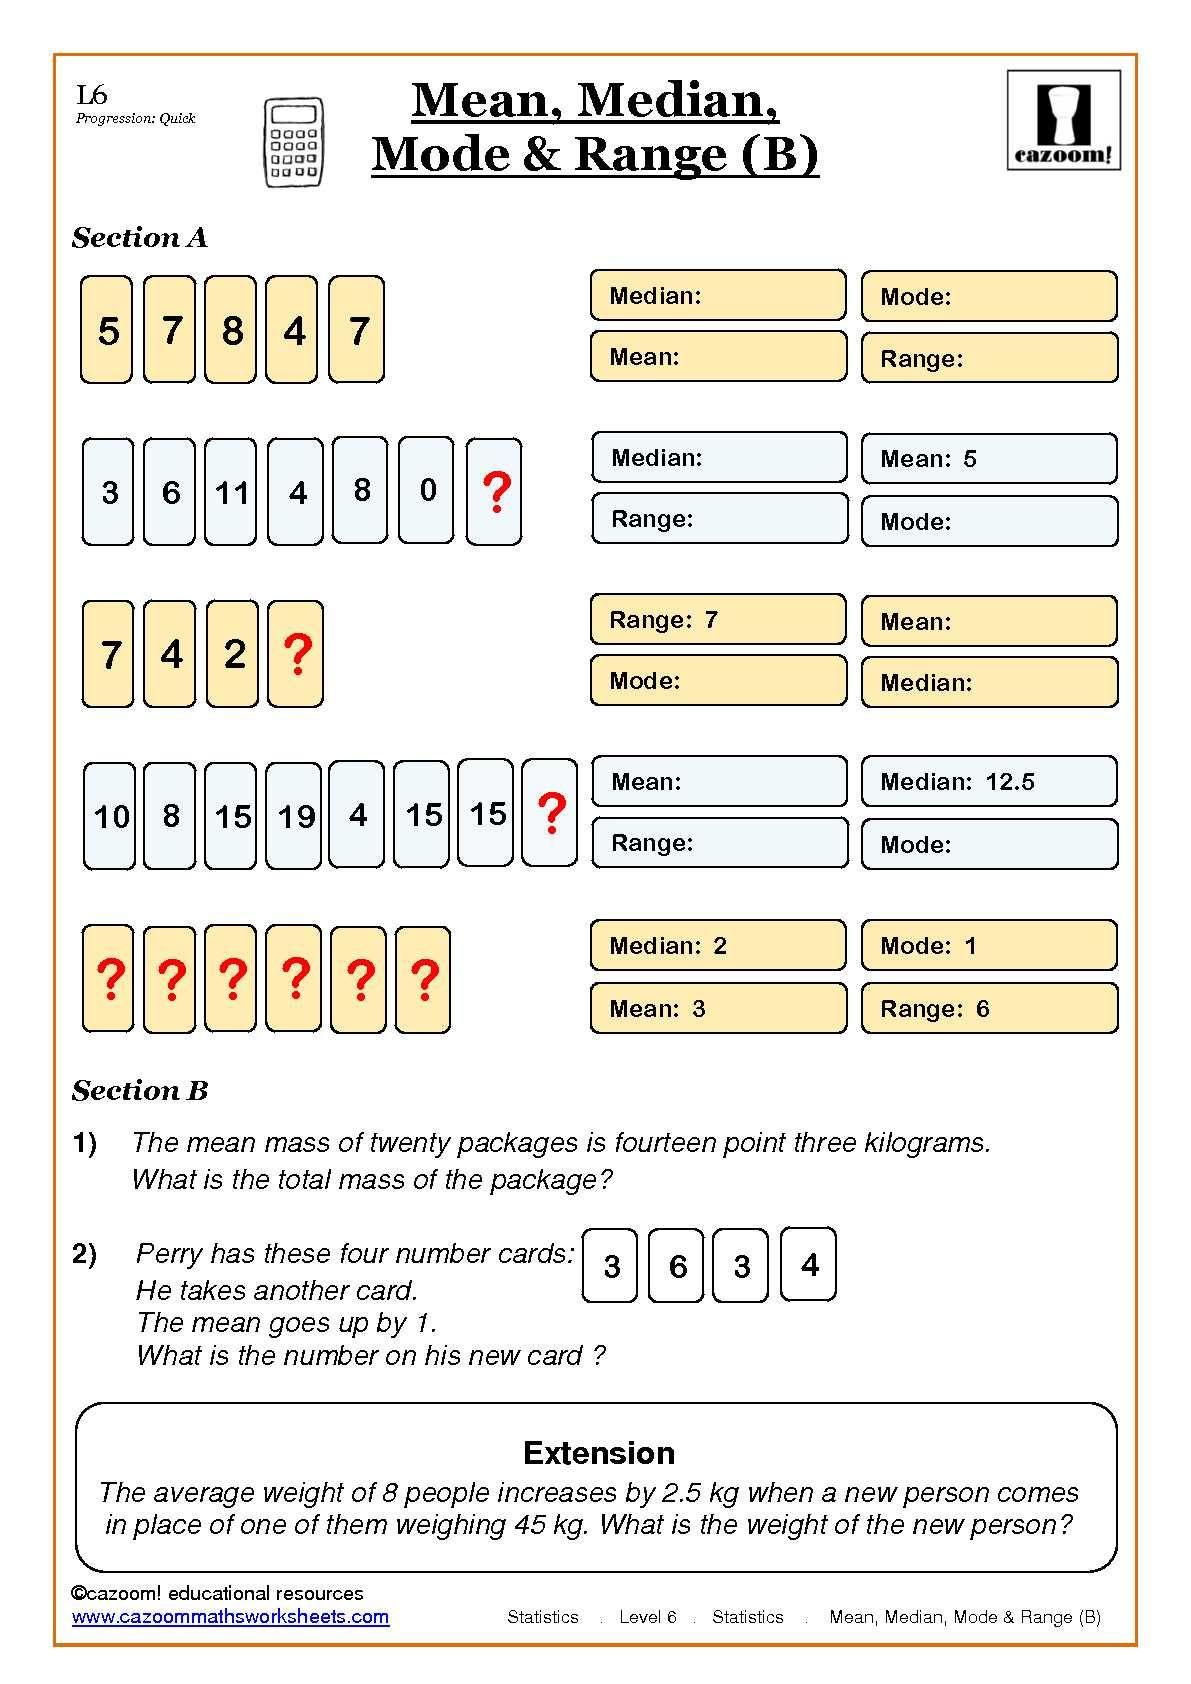 Cazoom Maths Worksheets - Statistic Maths Worksheets   Letter worksheets  for preschool [ 1684 x 1191 Pixel ]